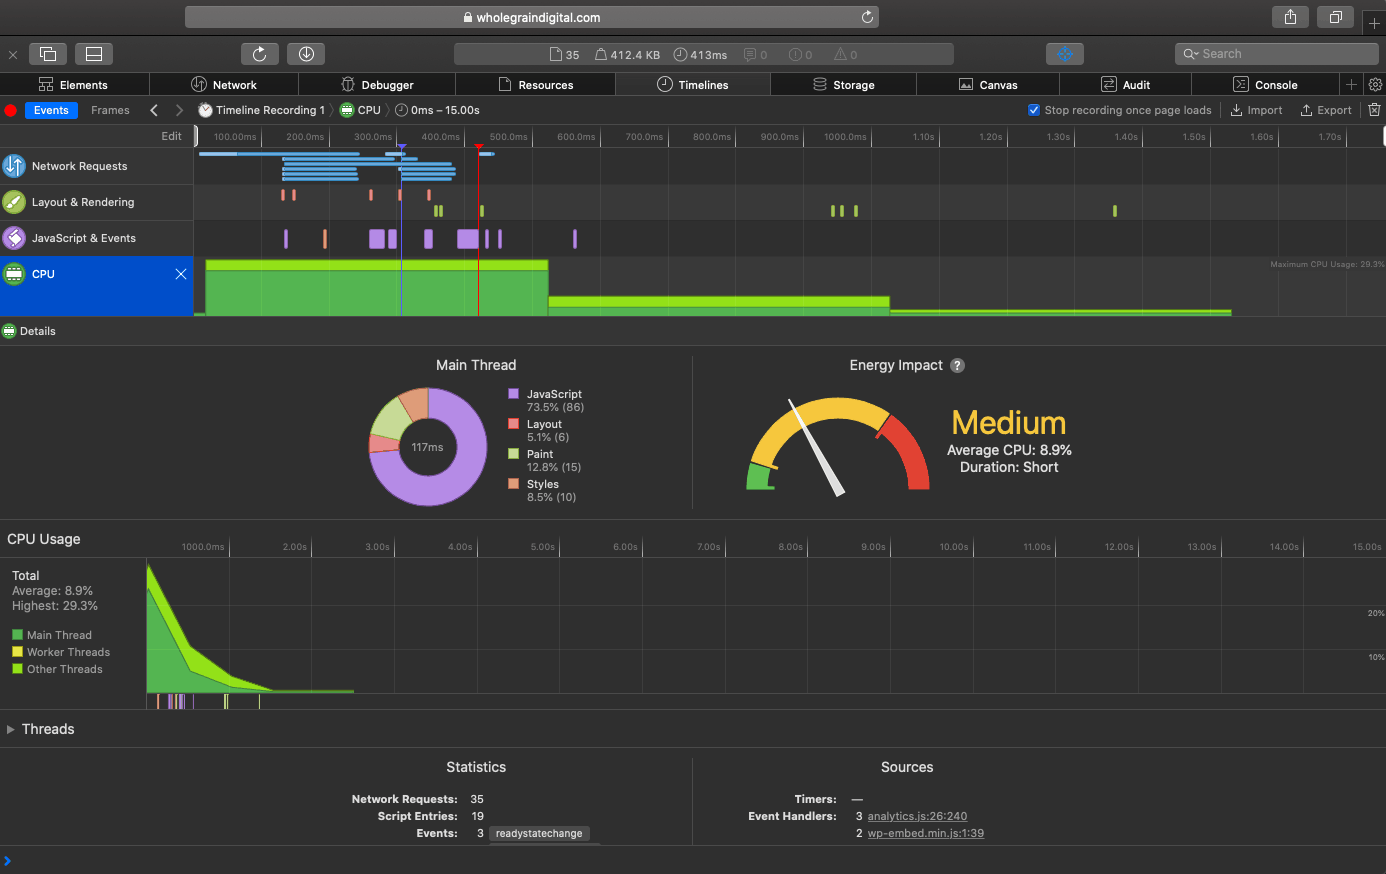 Safari Web Inspector showing energy impact of a website